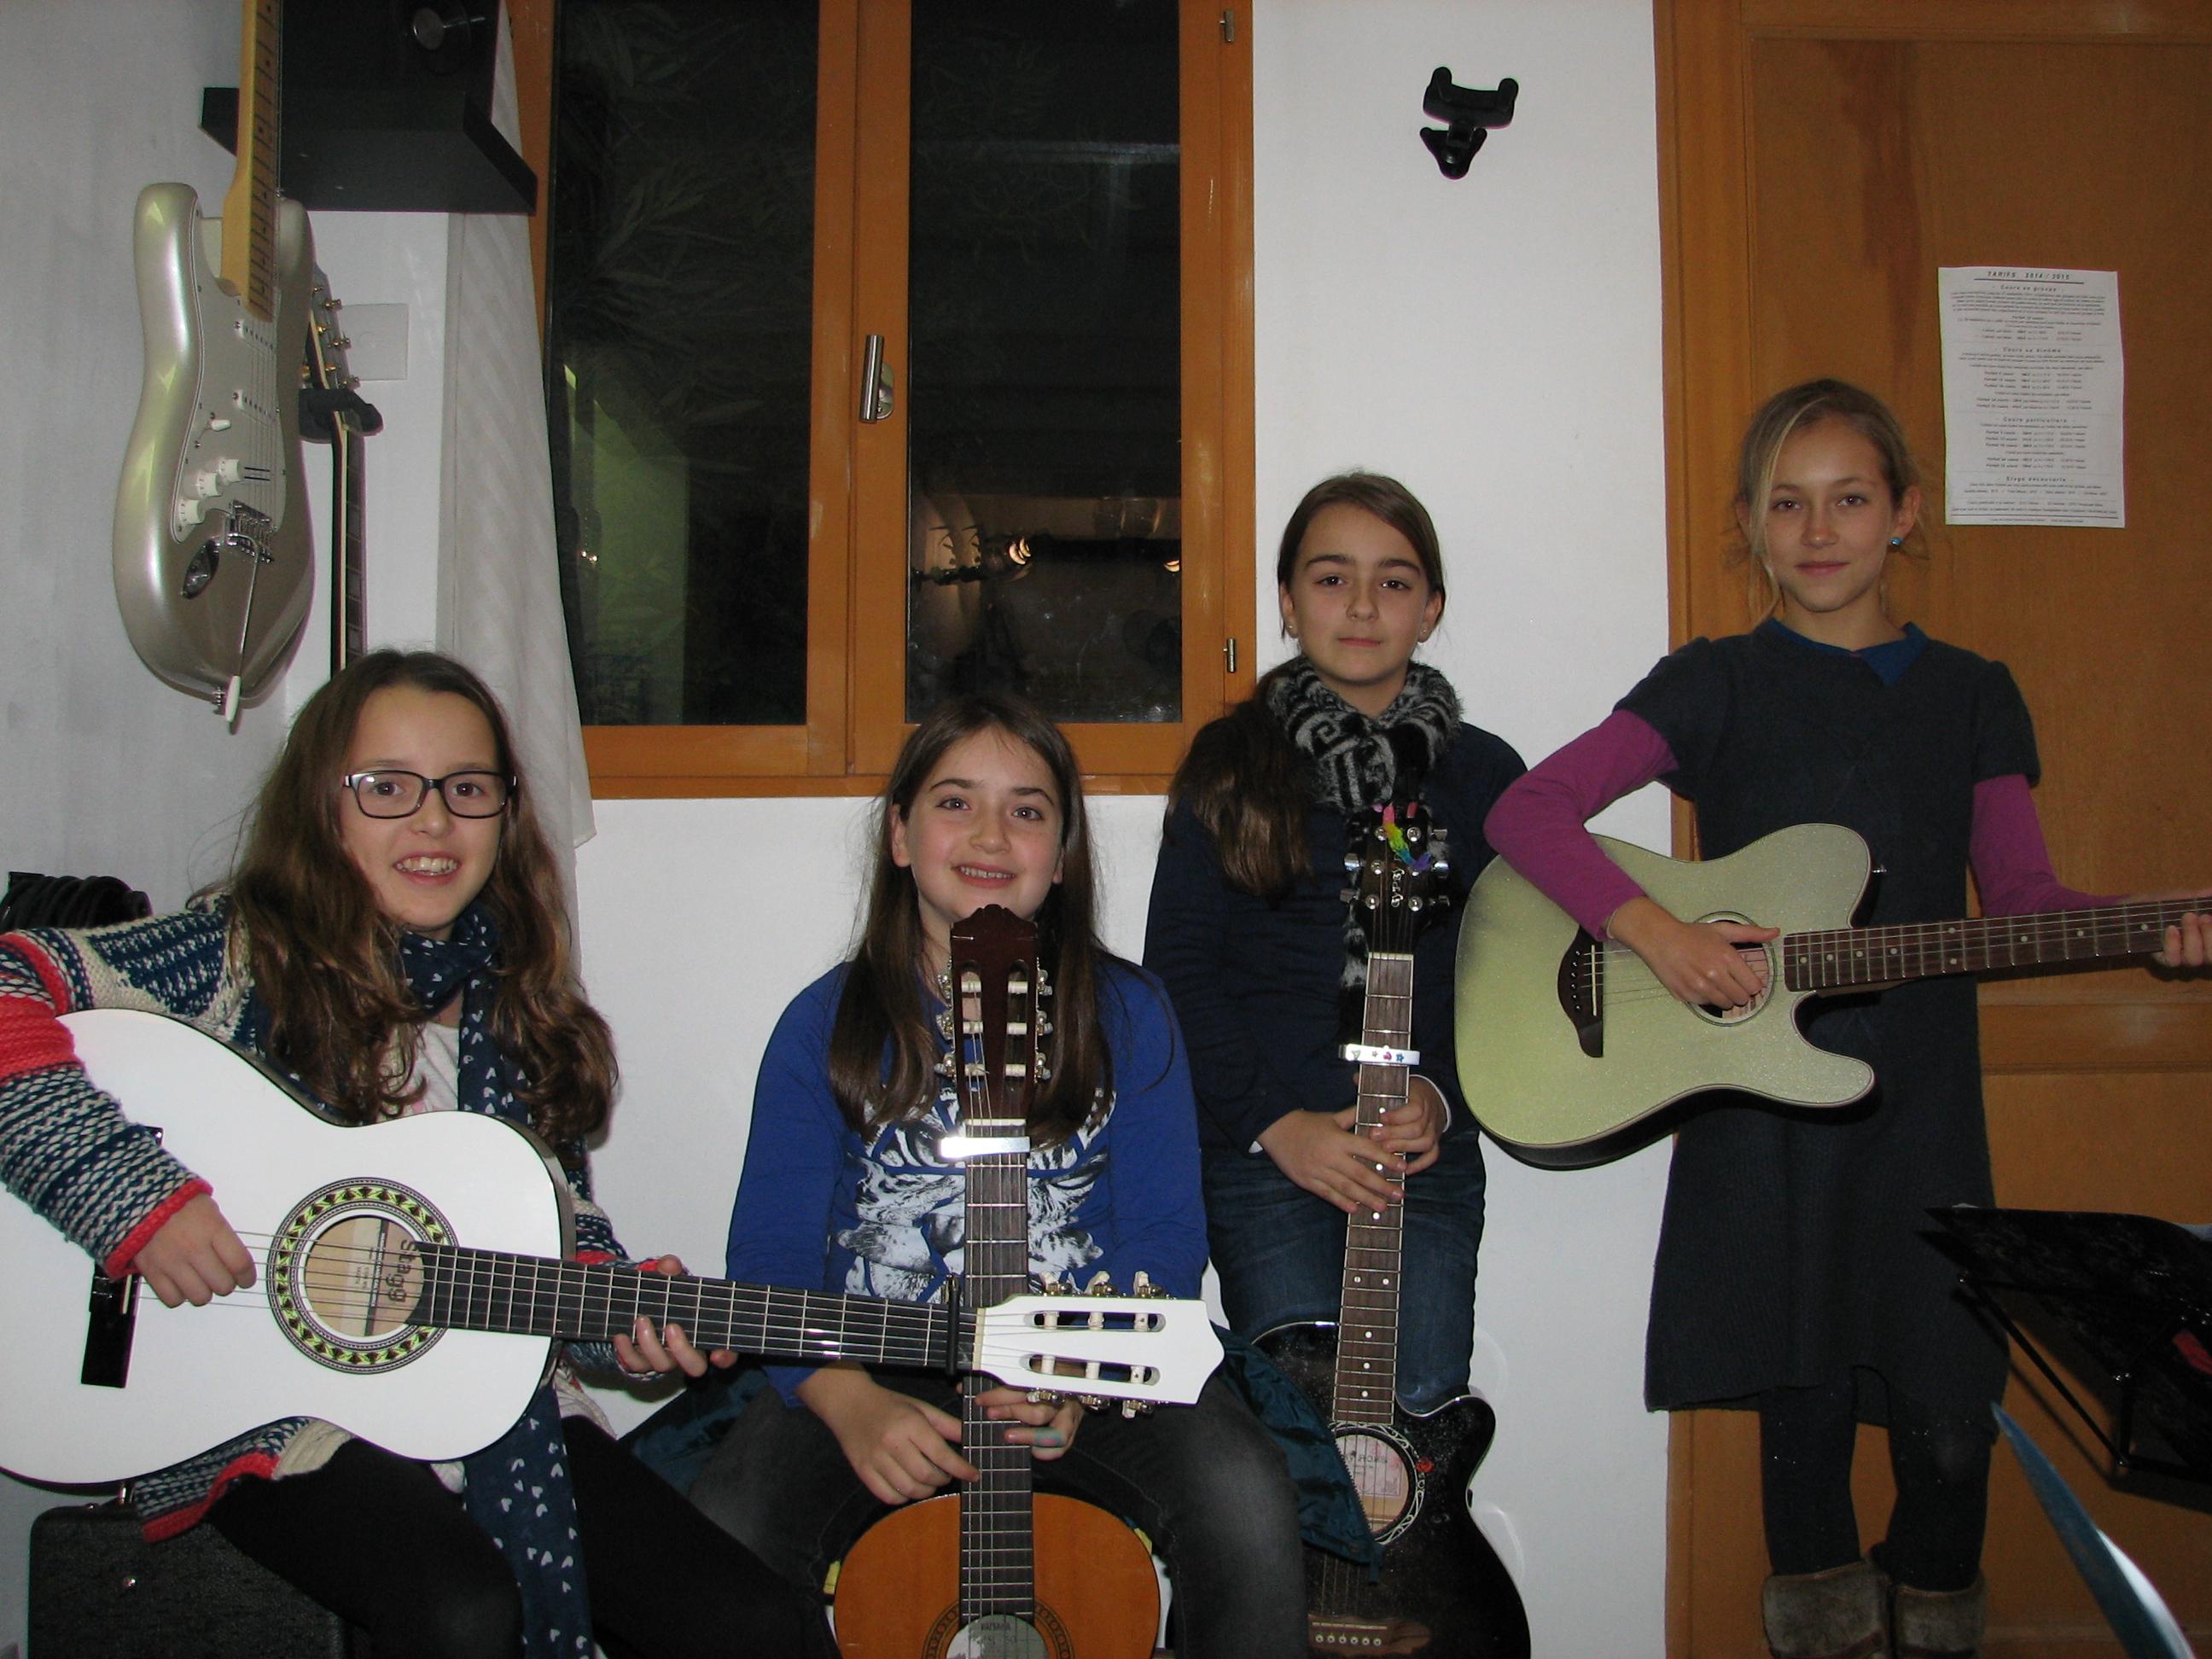 Ilona, Ana, Lou et Fanny